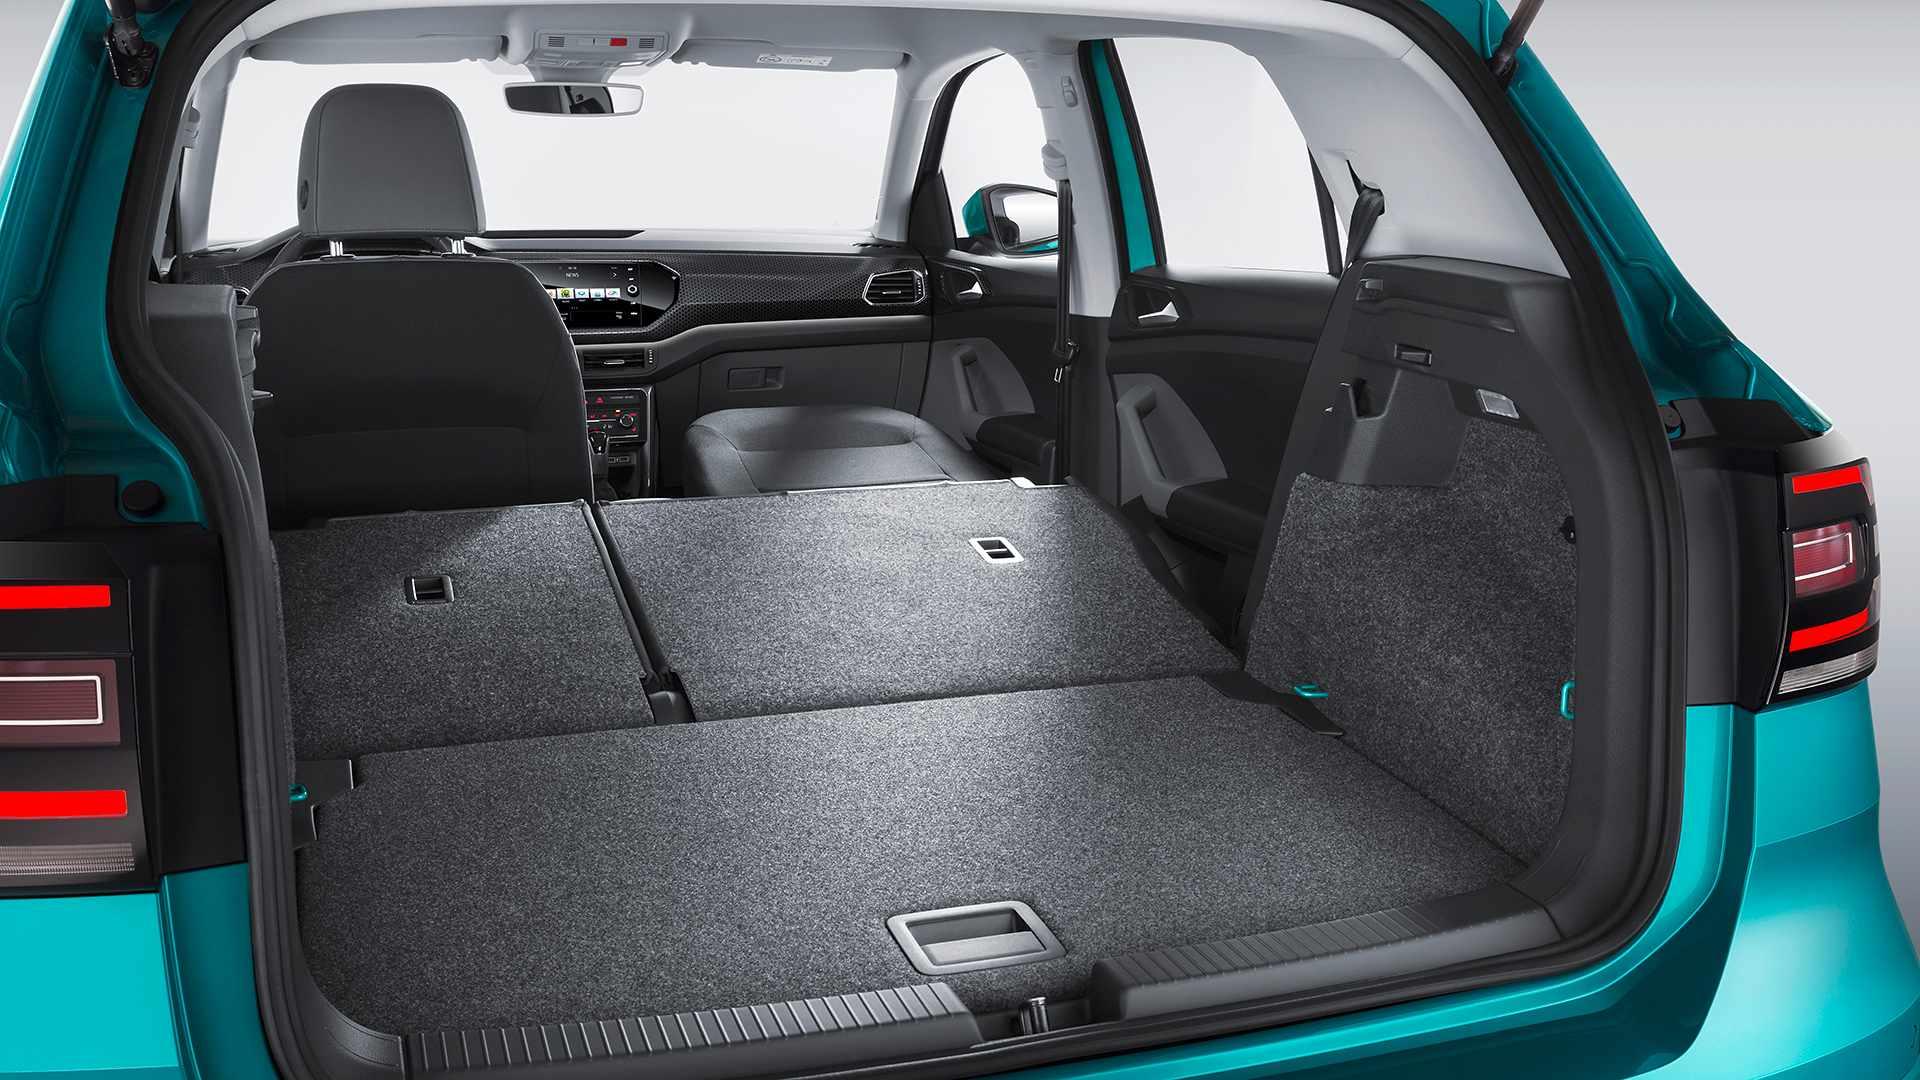 عرضه خودروی VW T-Cross Coupe شرکت فولکس واگن تا اواخر سال ۲۰۲۰